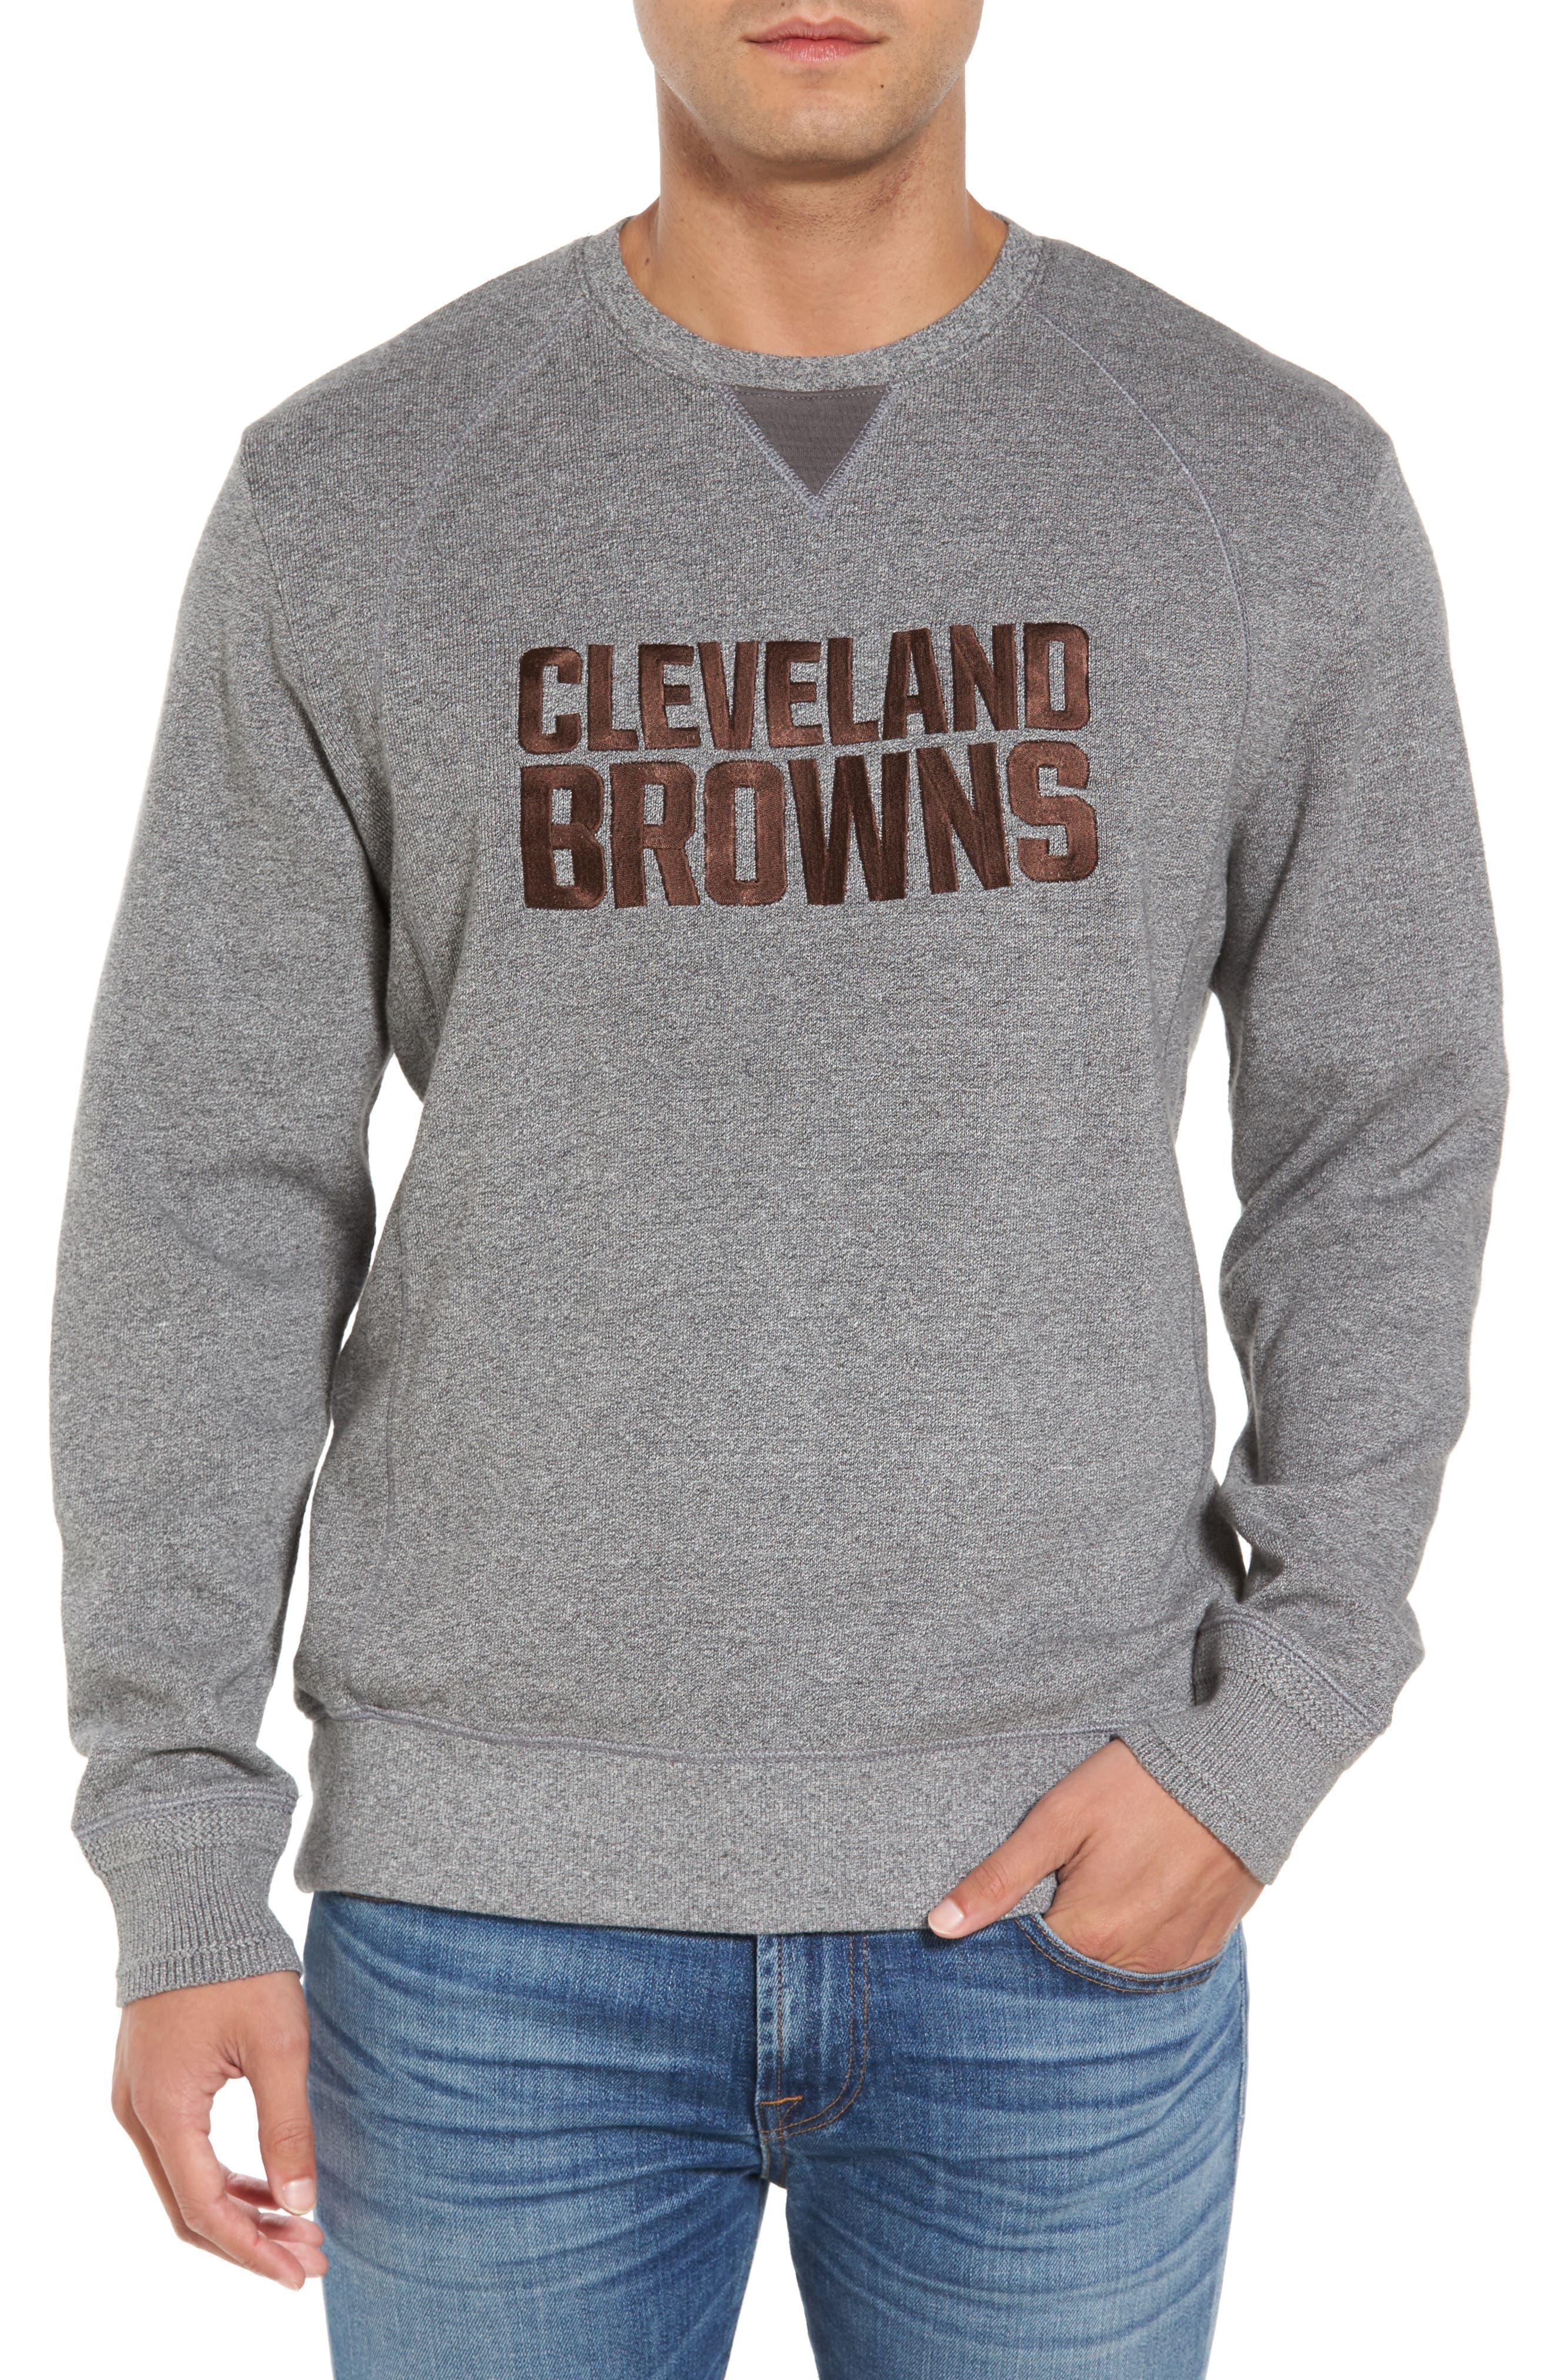 NFL Stitch of Liberty Embroidered Crewneck Sweatshirt,                             Main thumbnail 7, color,